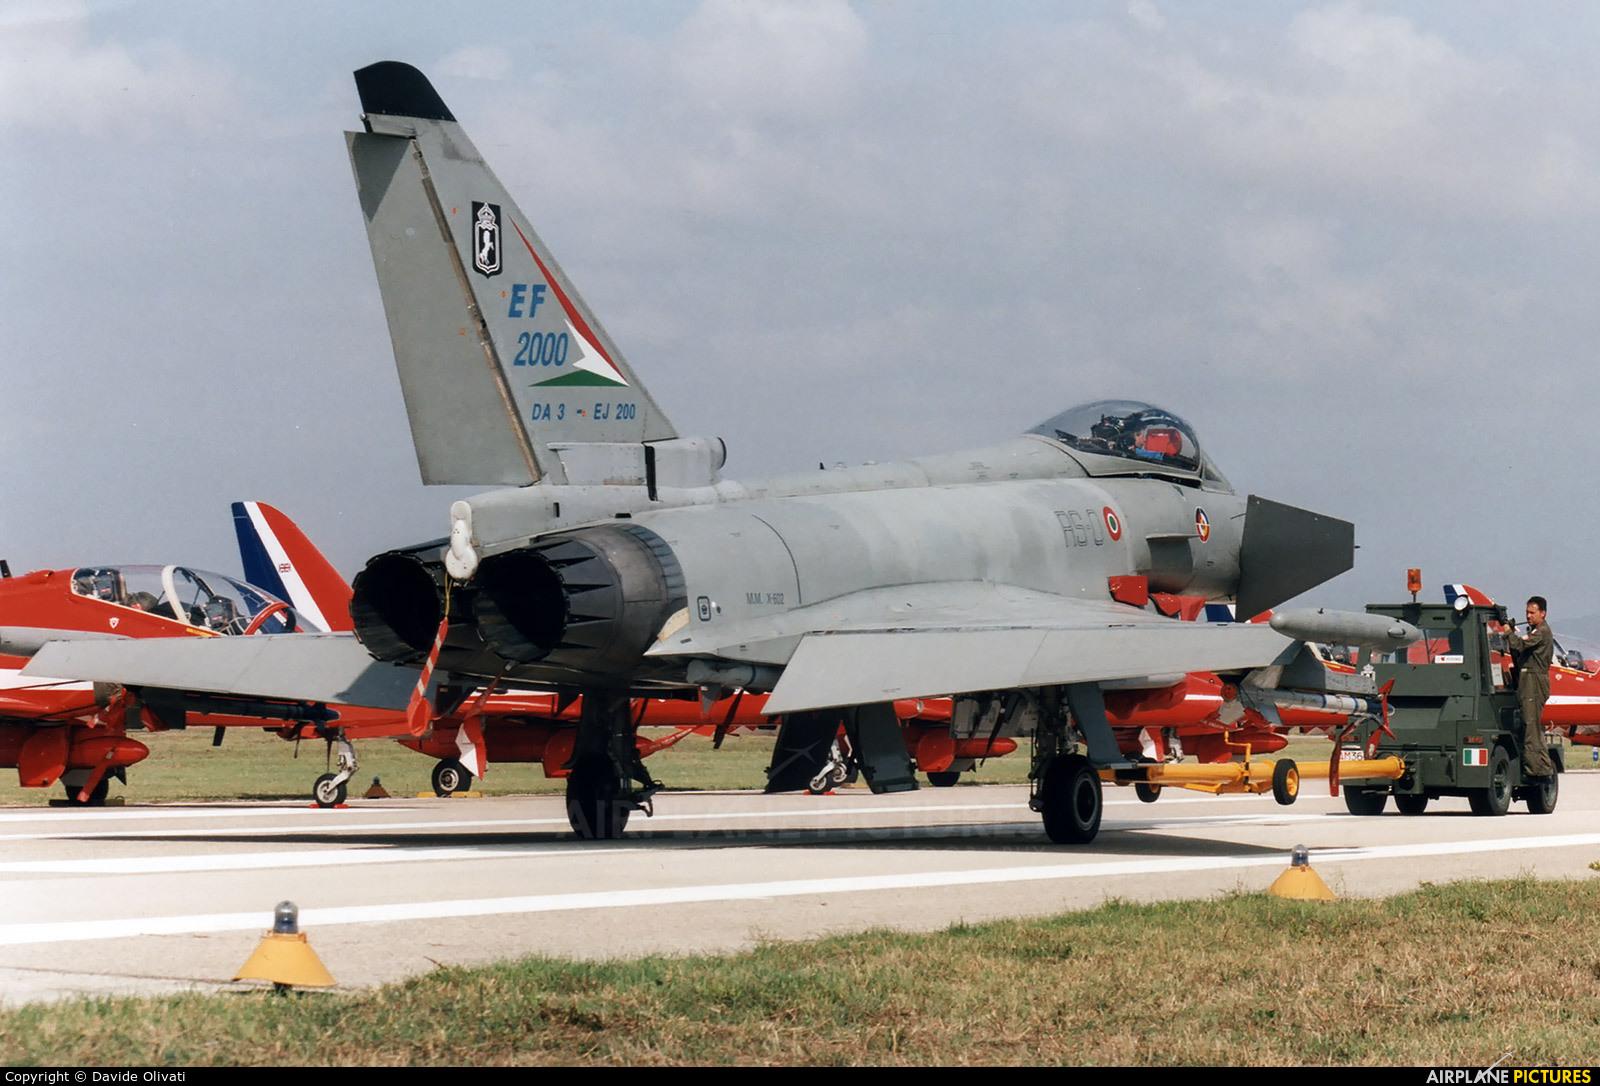 Italy - Air Force MMX-602 aircraft at Grosseto - Corrado Baccarini